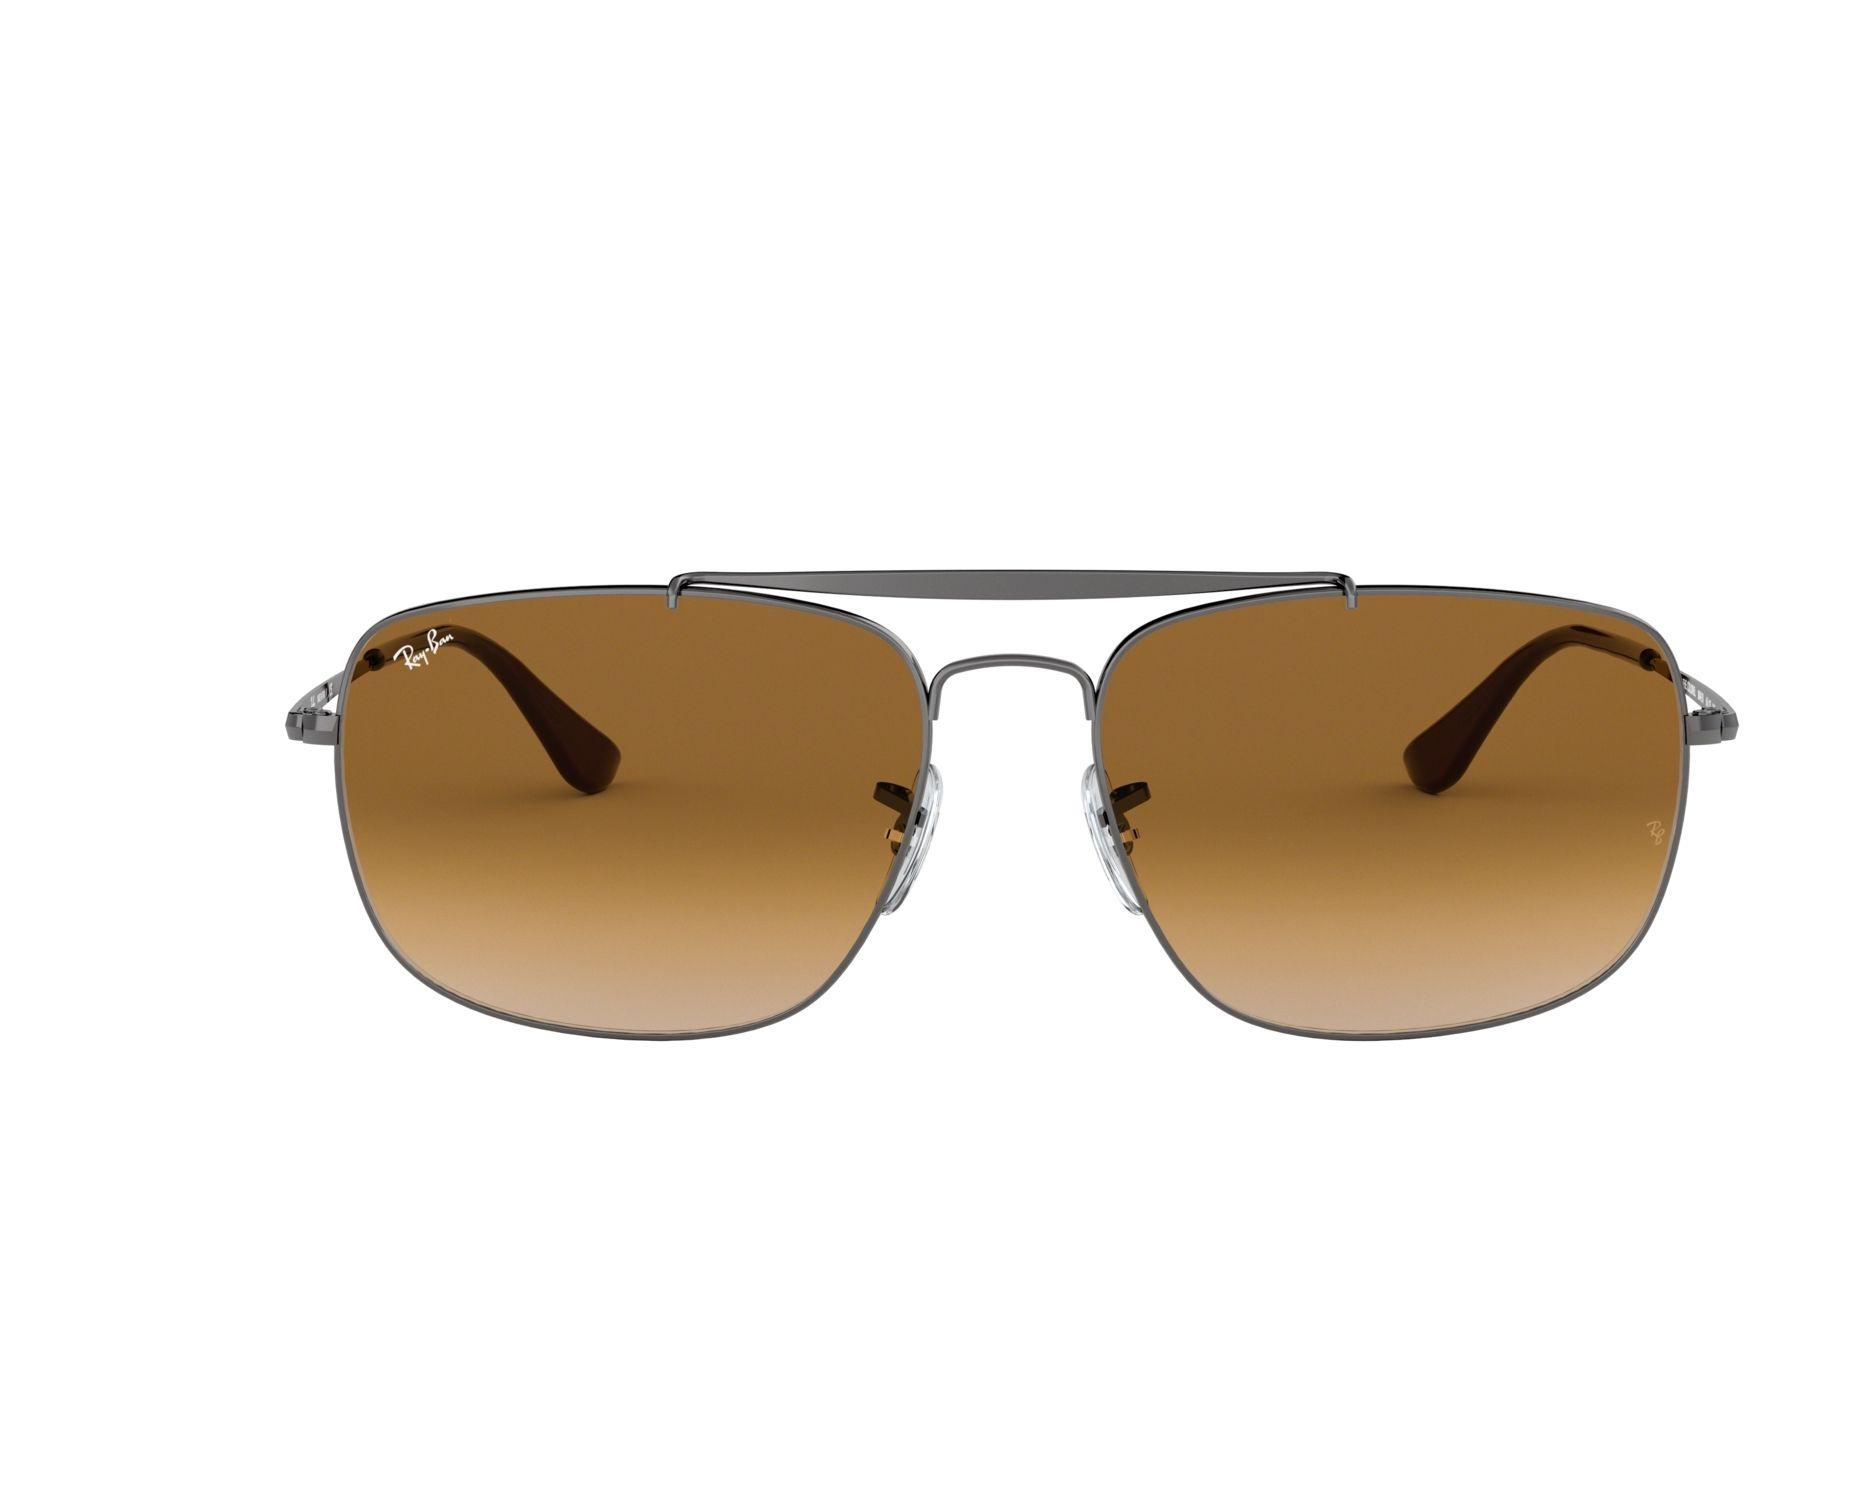 ca71e9b8fe0 Sunglasses Ray-Ban RB-3560 004 51 58-17 Gun 360 degree